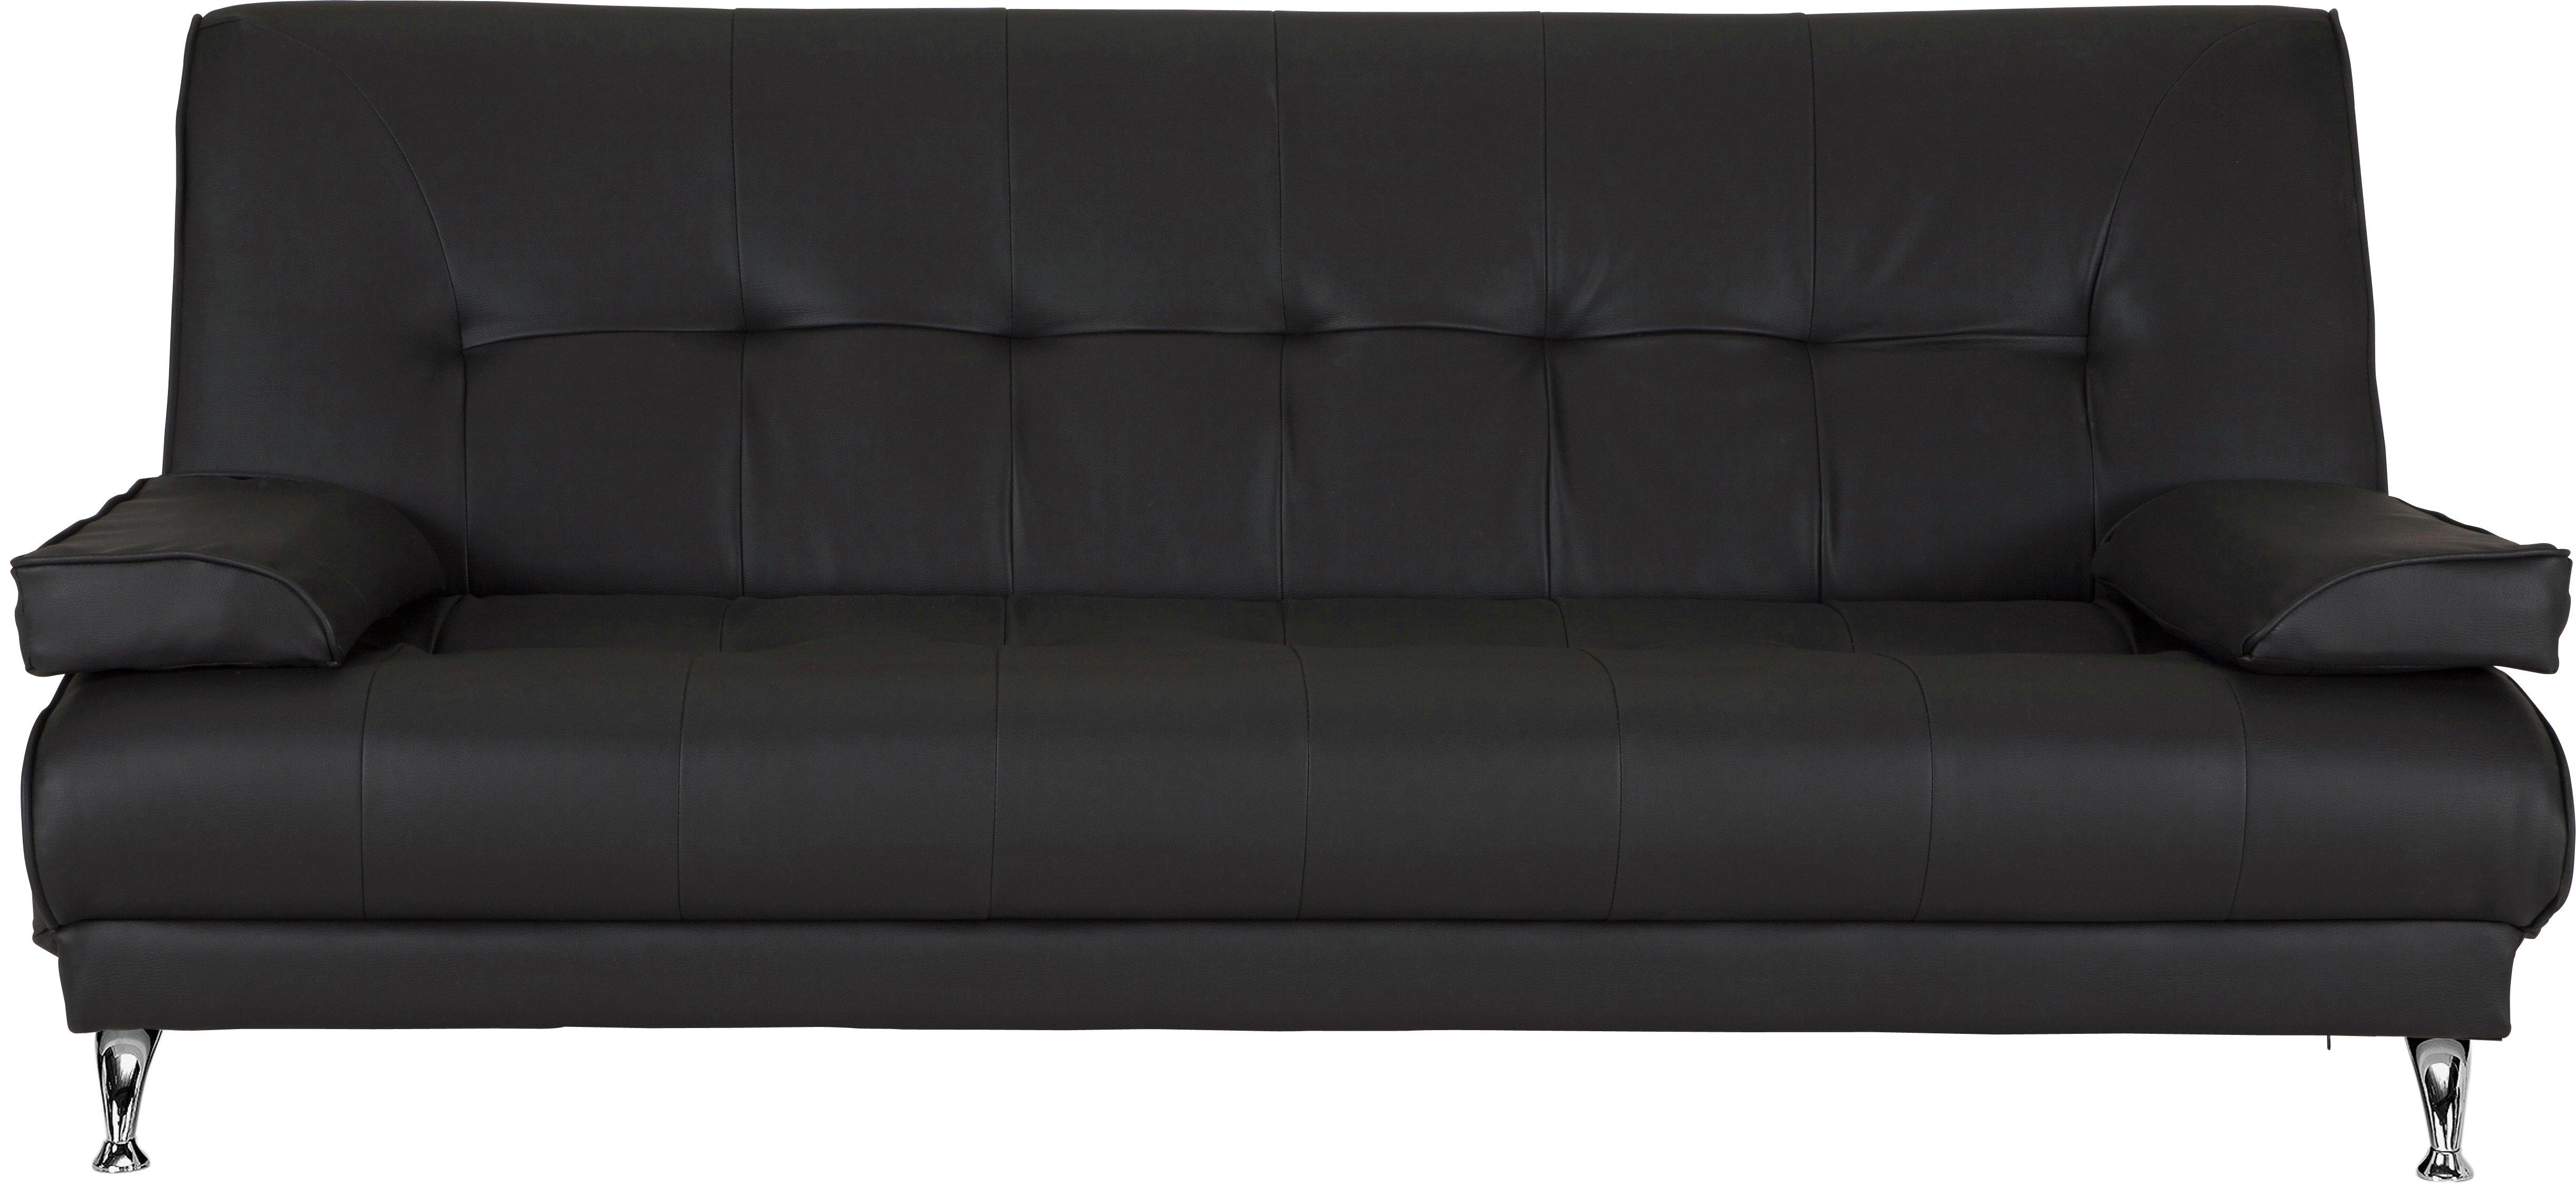 Argos Home Sicily 2 Seater Fabric Clic Clac Sofa Bed - Black